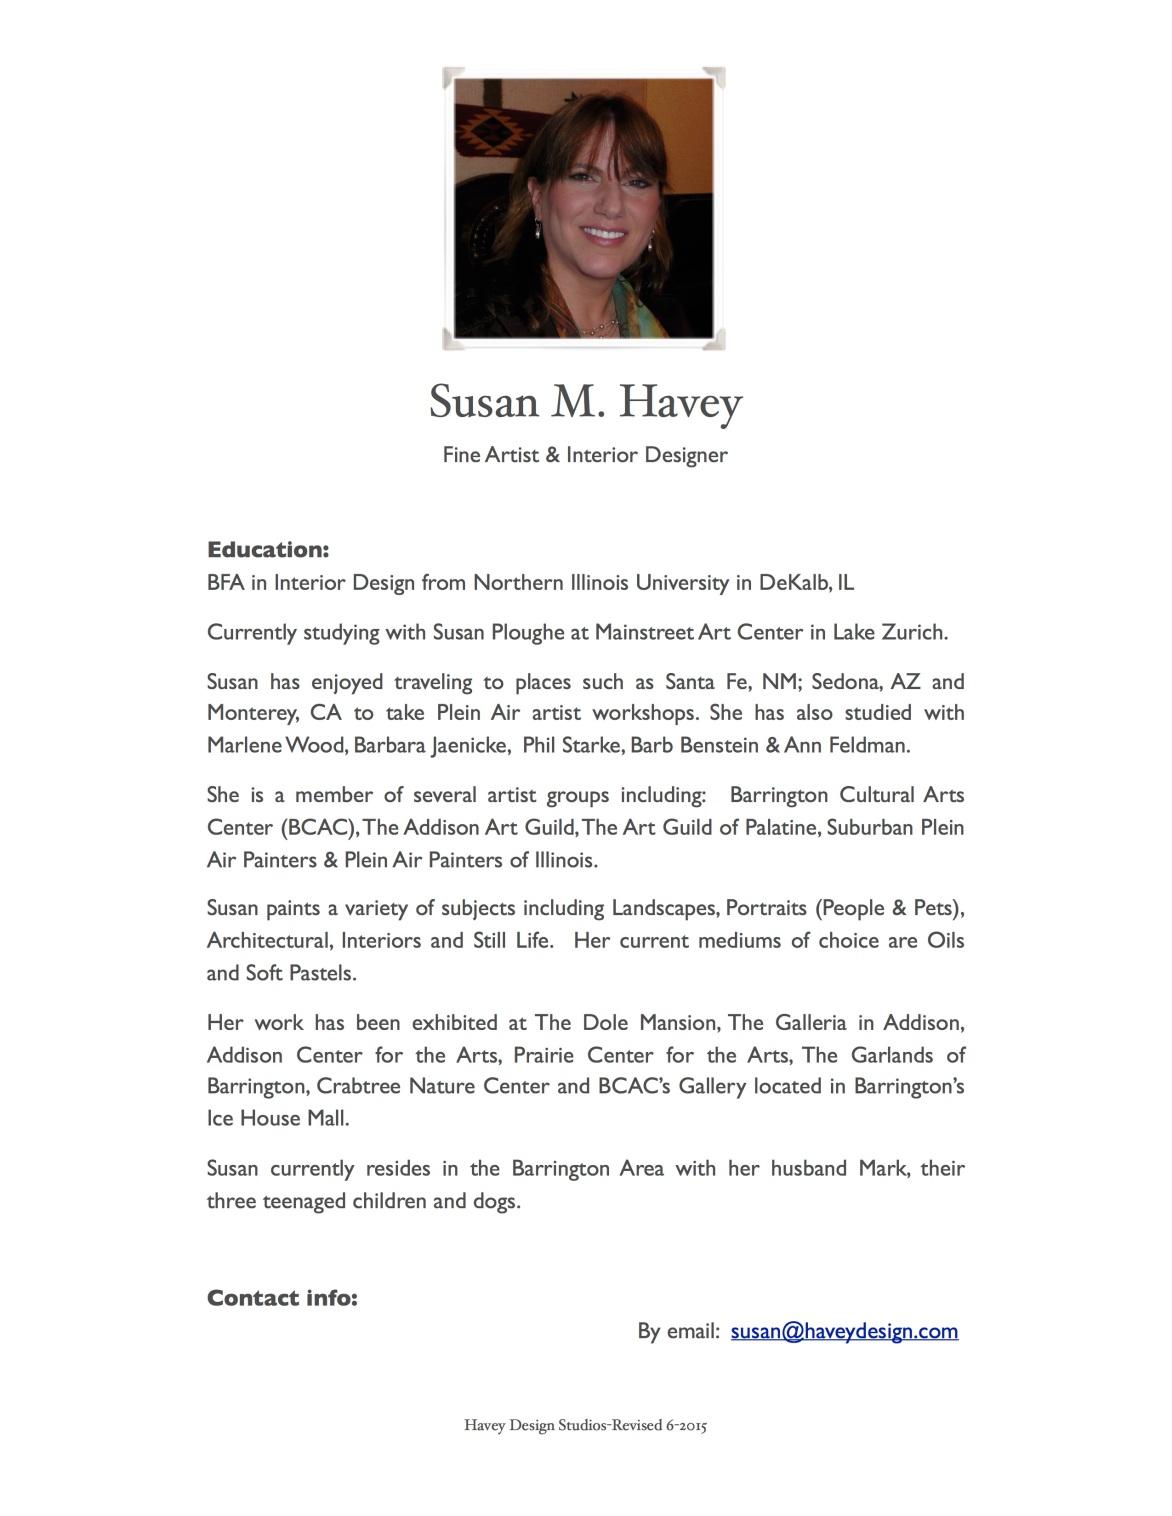 Susan's Artist Bio June 7, 2015